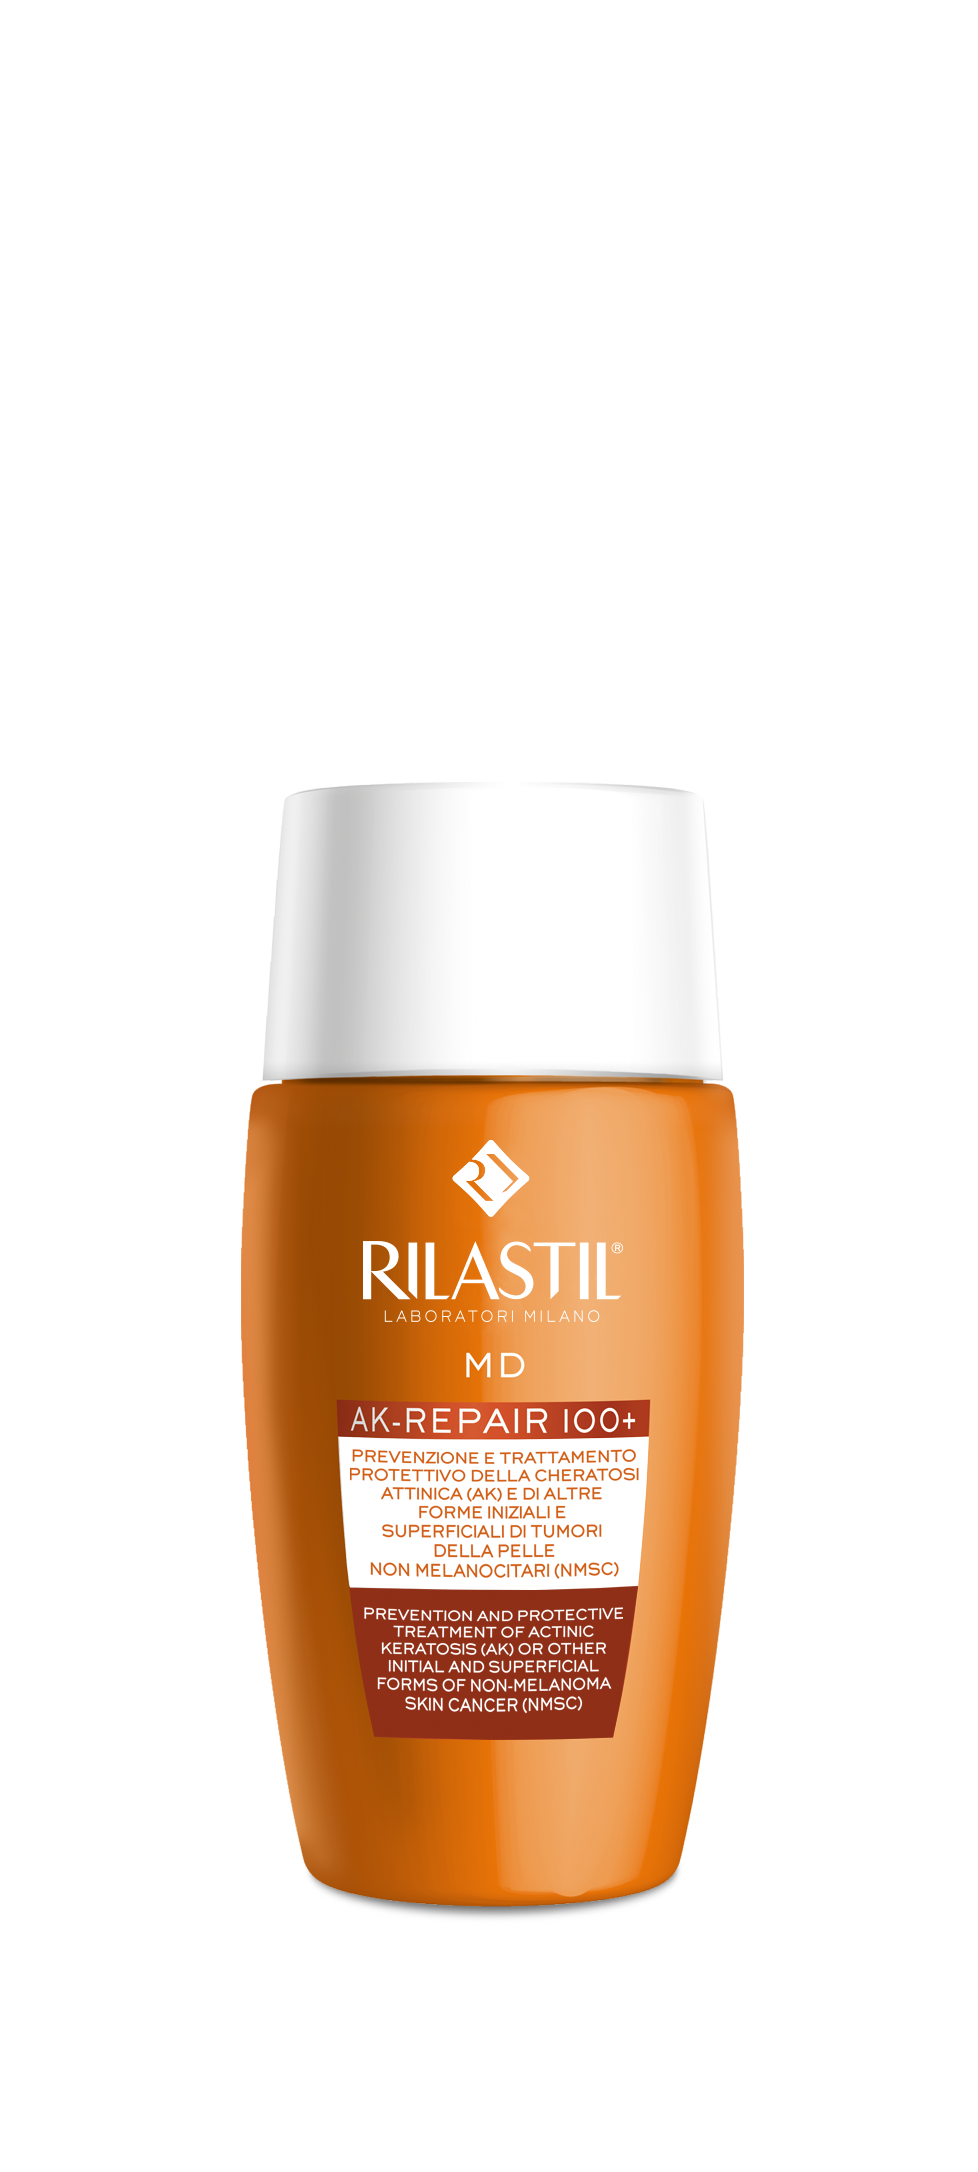 Rilastil MD AK-REPAIR 100+ Λεπτόρρευστο γαλάκτωμα ταχείας απορρόφησης, 50ml